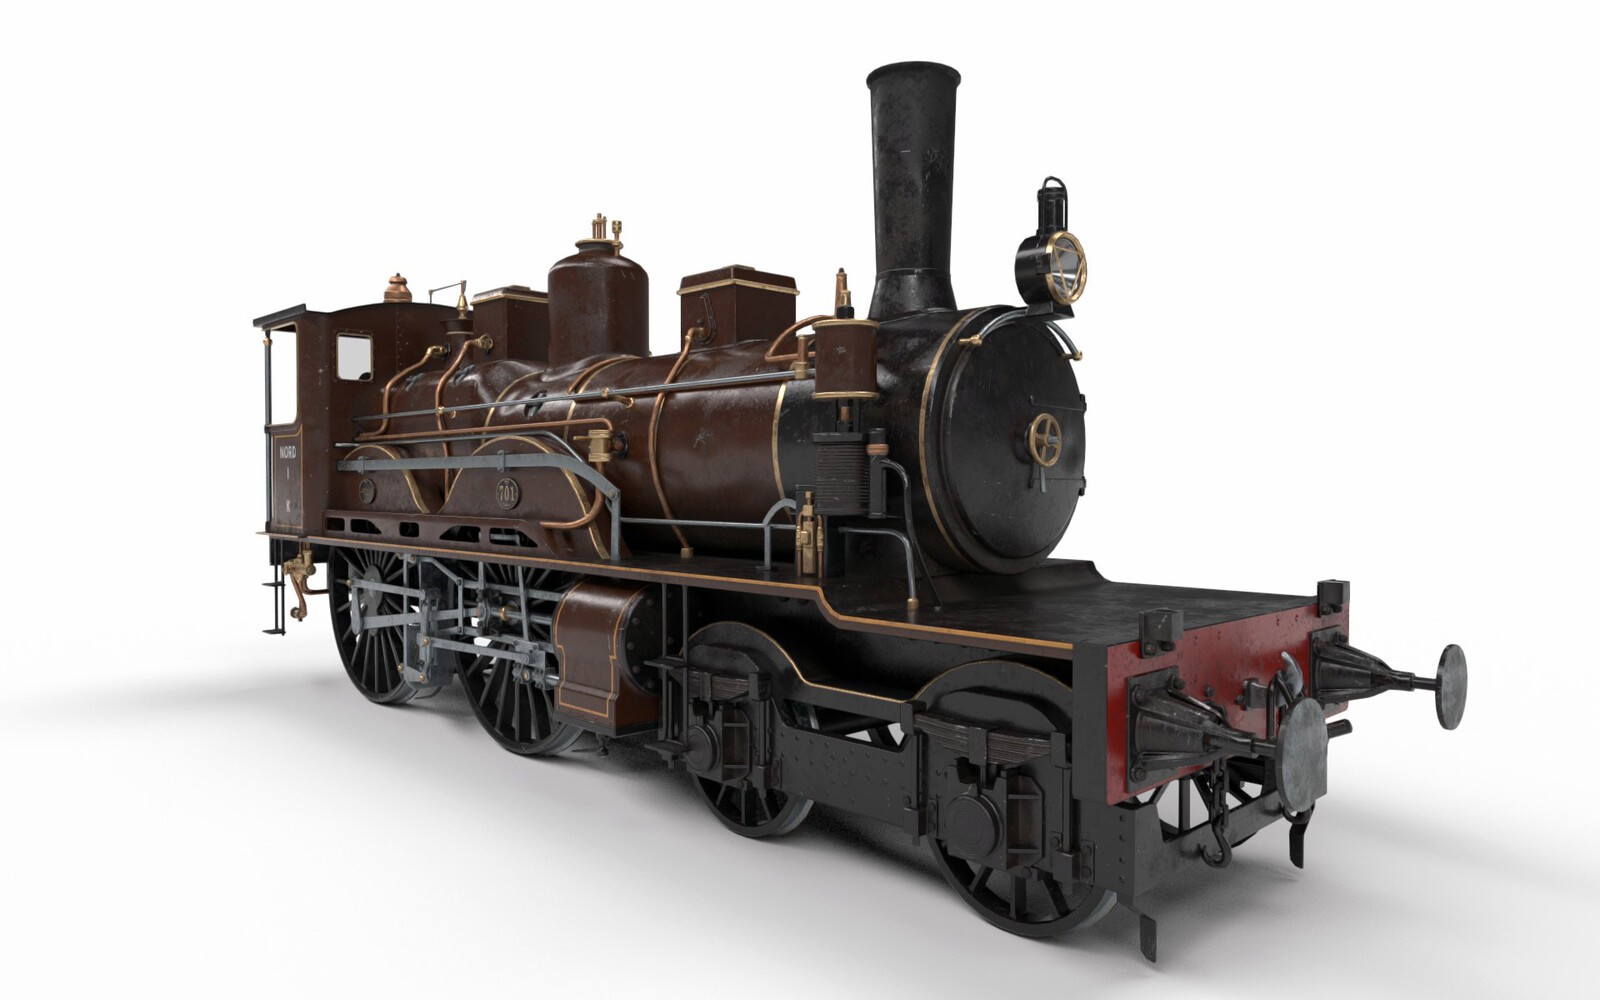 de Glehn (historical train)